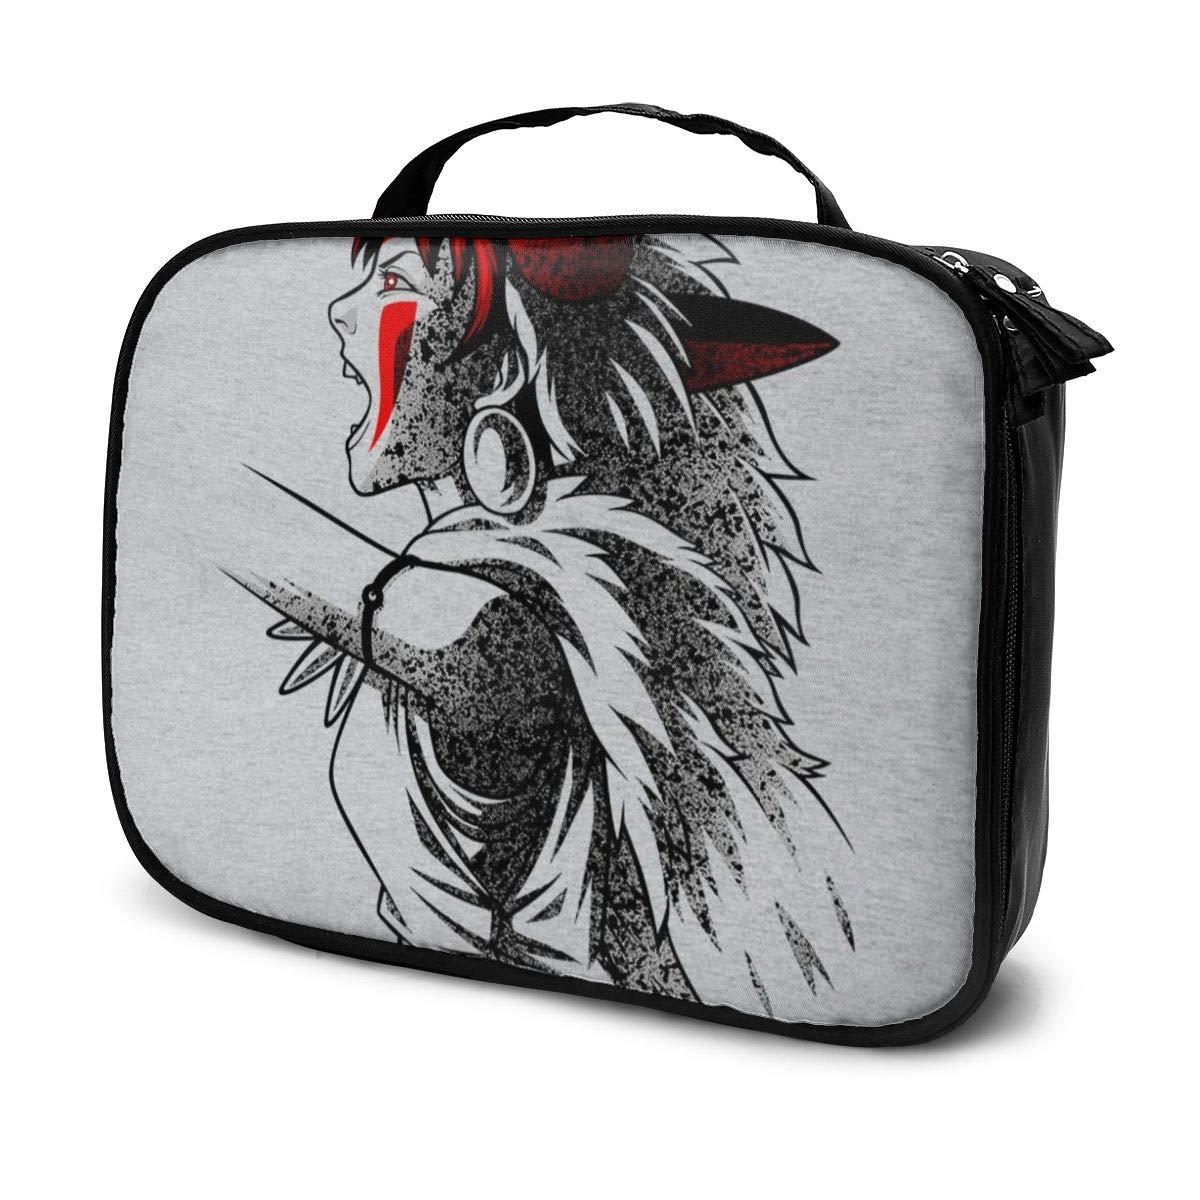 Makeup Bag Cosmetic Pouch Princess Mononoke Side Profile Multi-Functional Bag Travel Kit